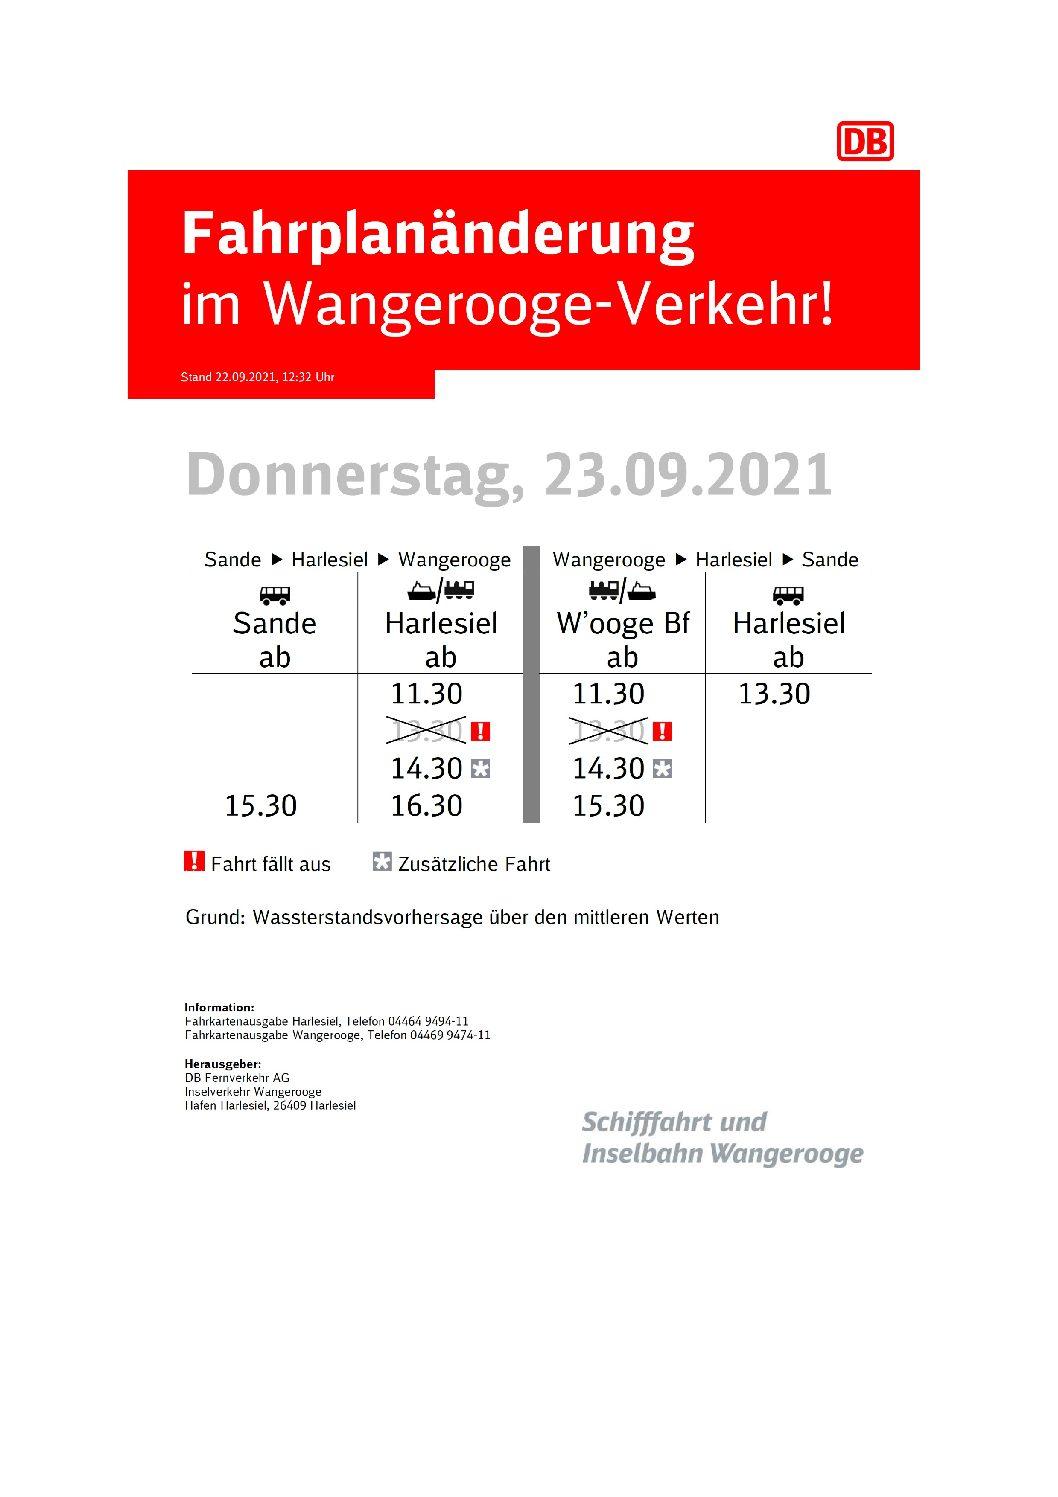 22.09.2021 DB/SIW Fahrplanänderung